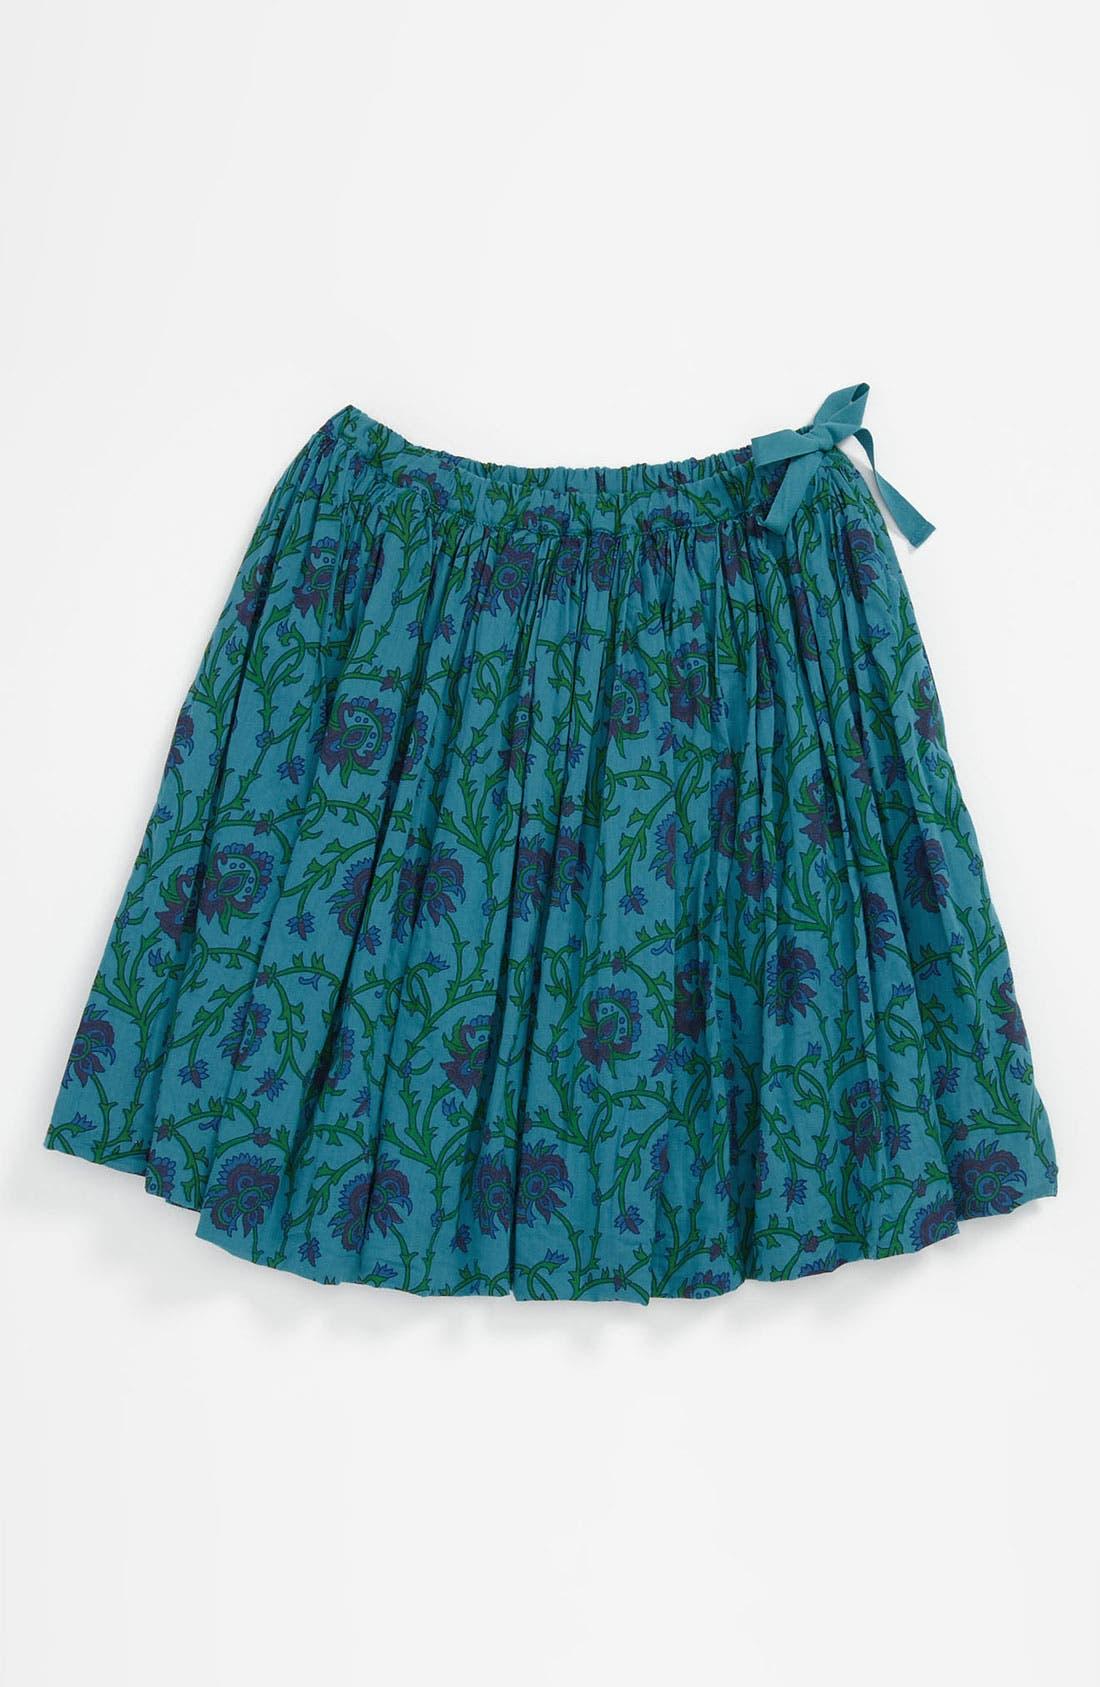 Peek 'Eve' Skirt, Main, color, 442